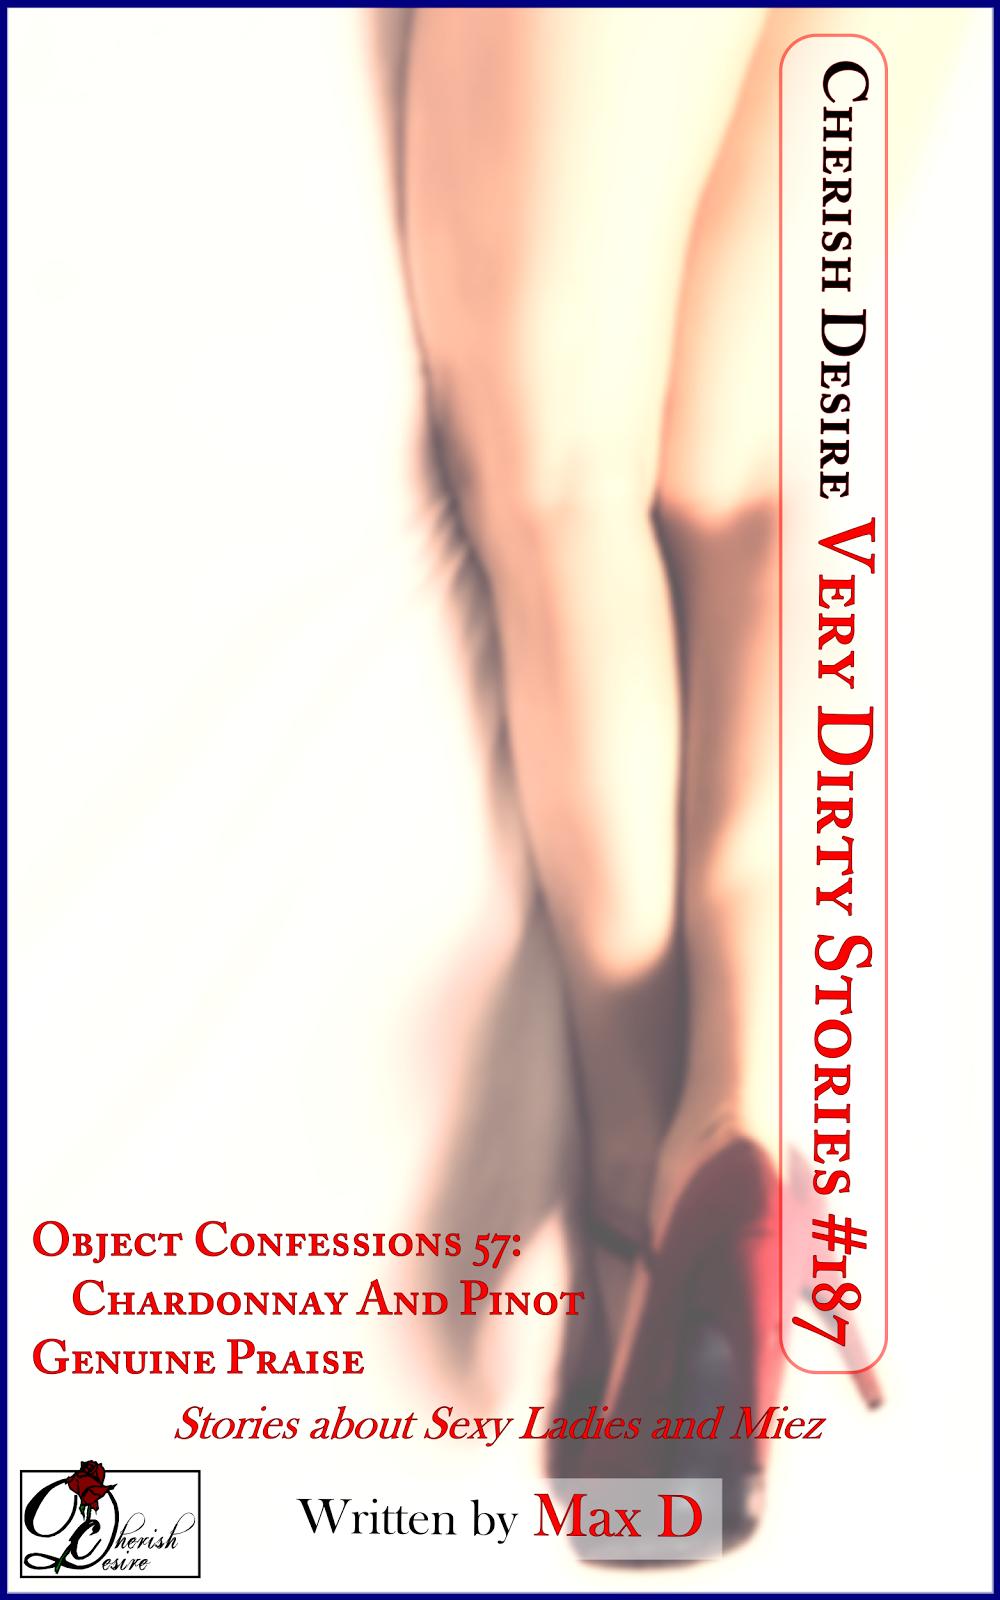 Cherish Desire: Very Dirty Stories #187, Max D, erotica